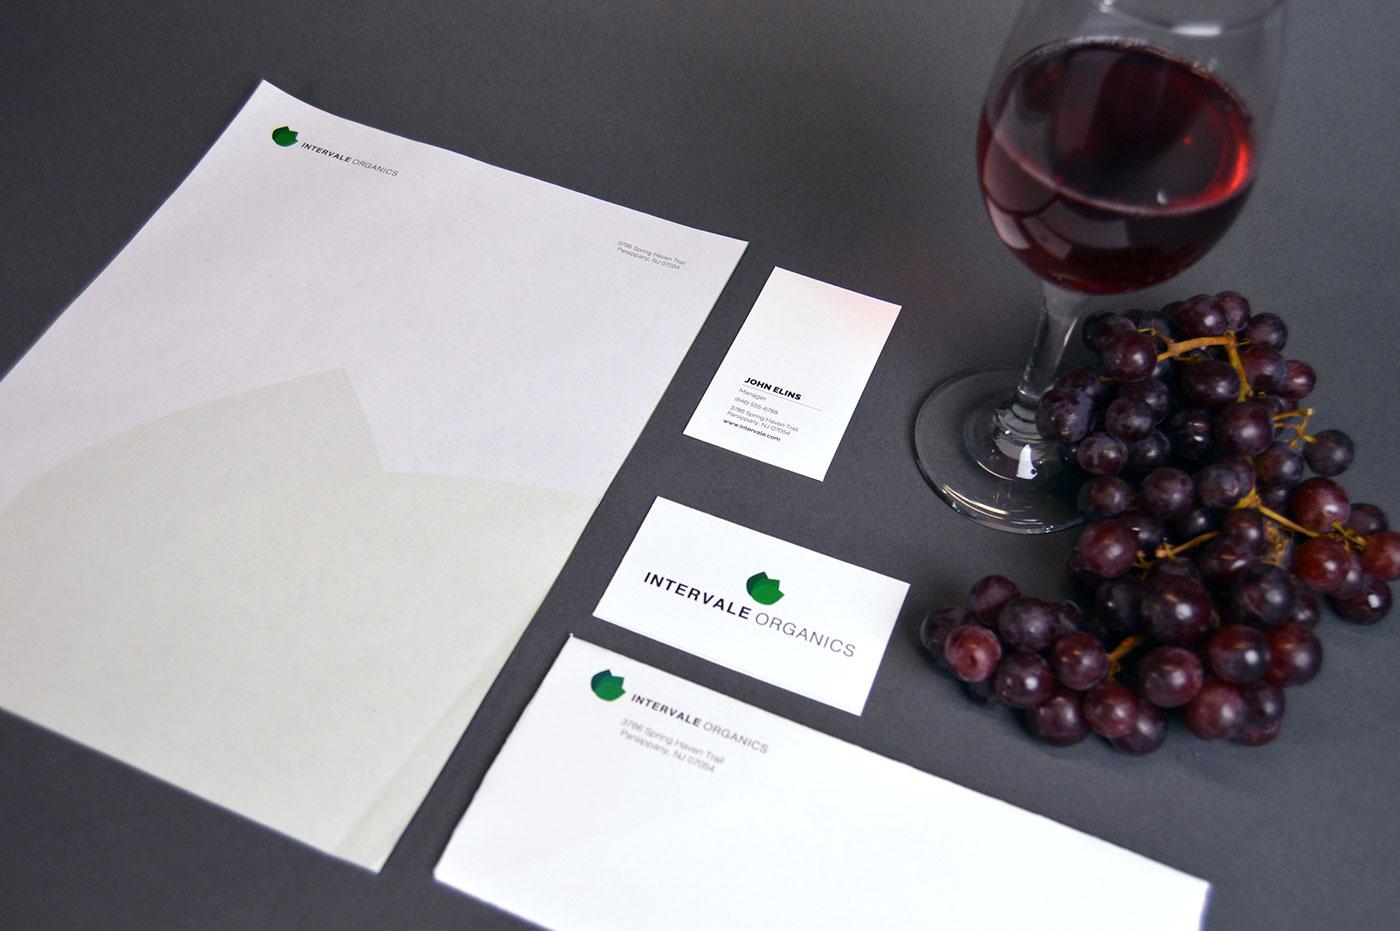 wine letterpress business card organic wine